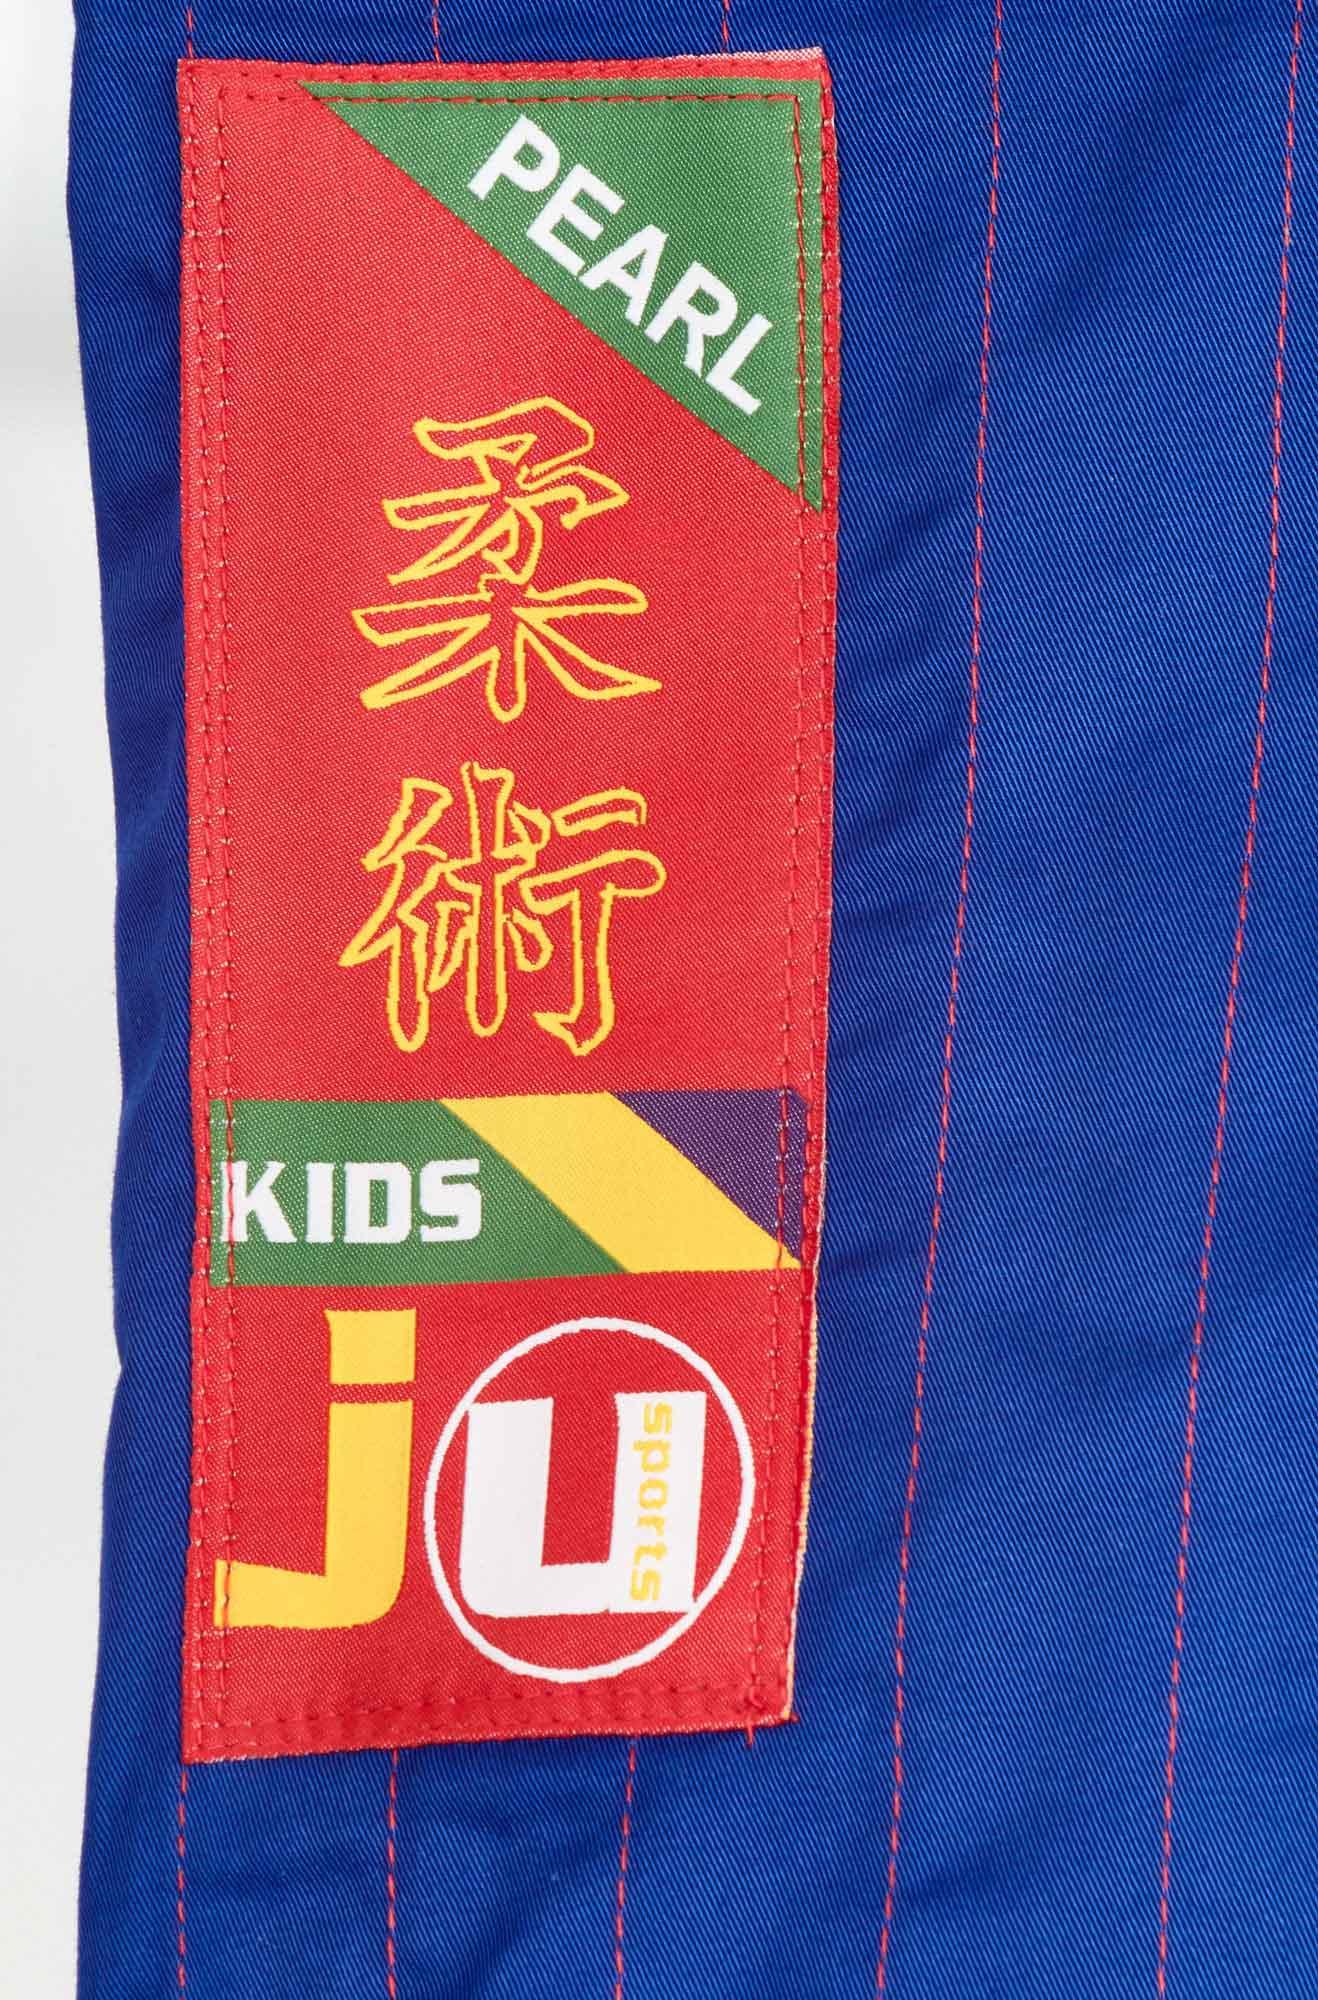 9247000-BJJ-Gi-Kids-blau-d4